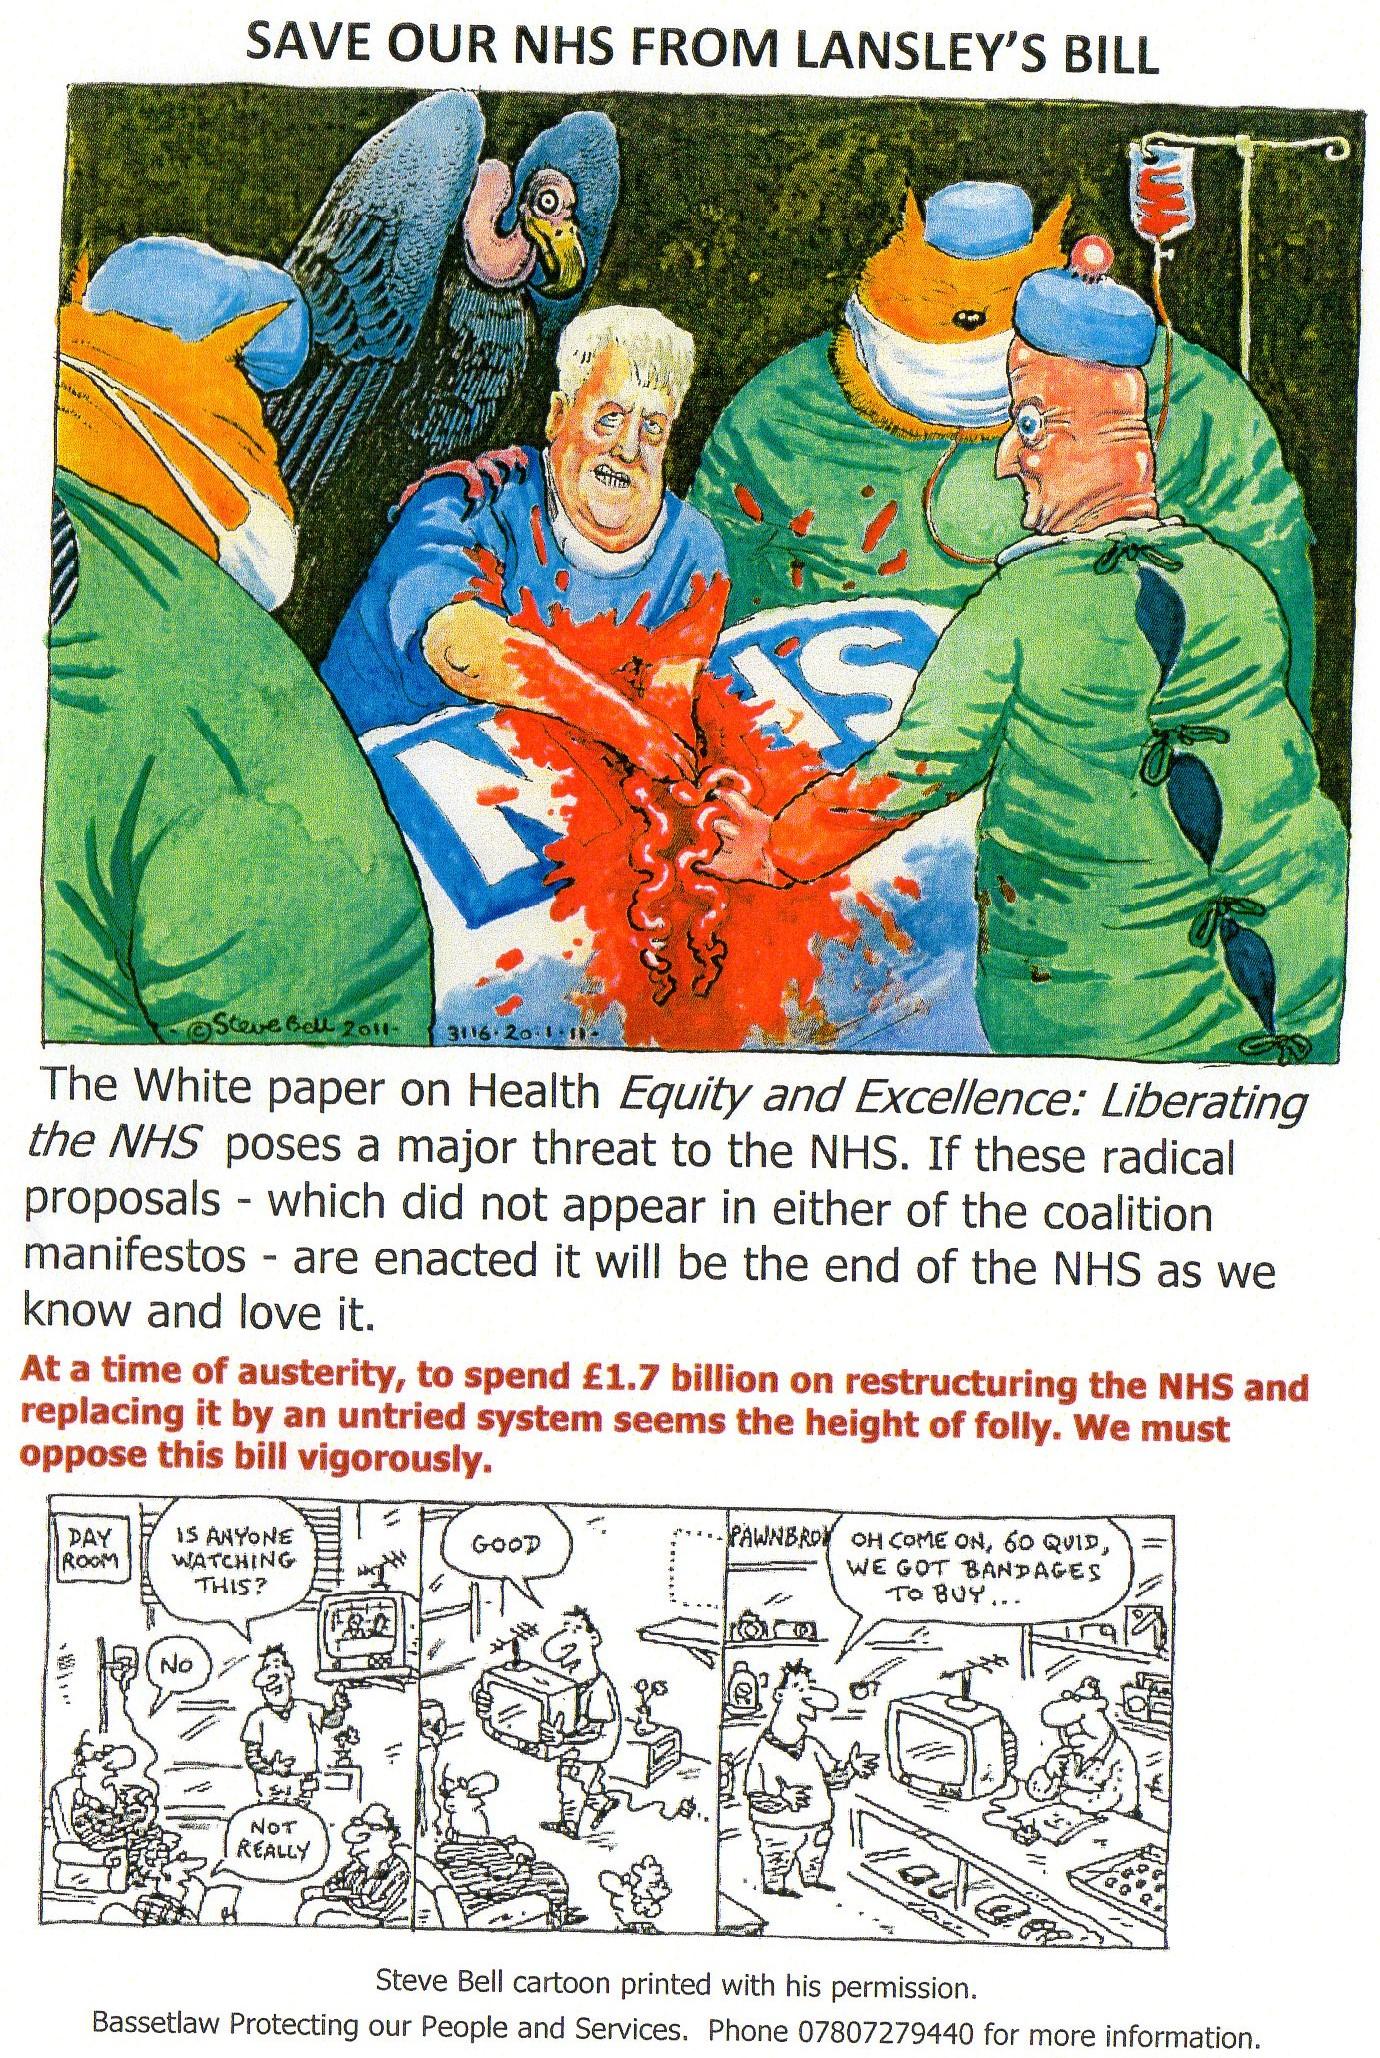 Opposing the NHS Reform Bill in Edwinstowe 17/05/2011